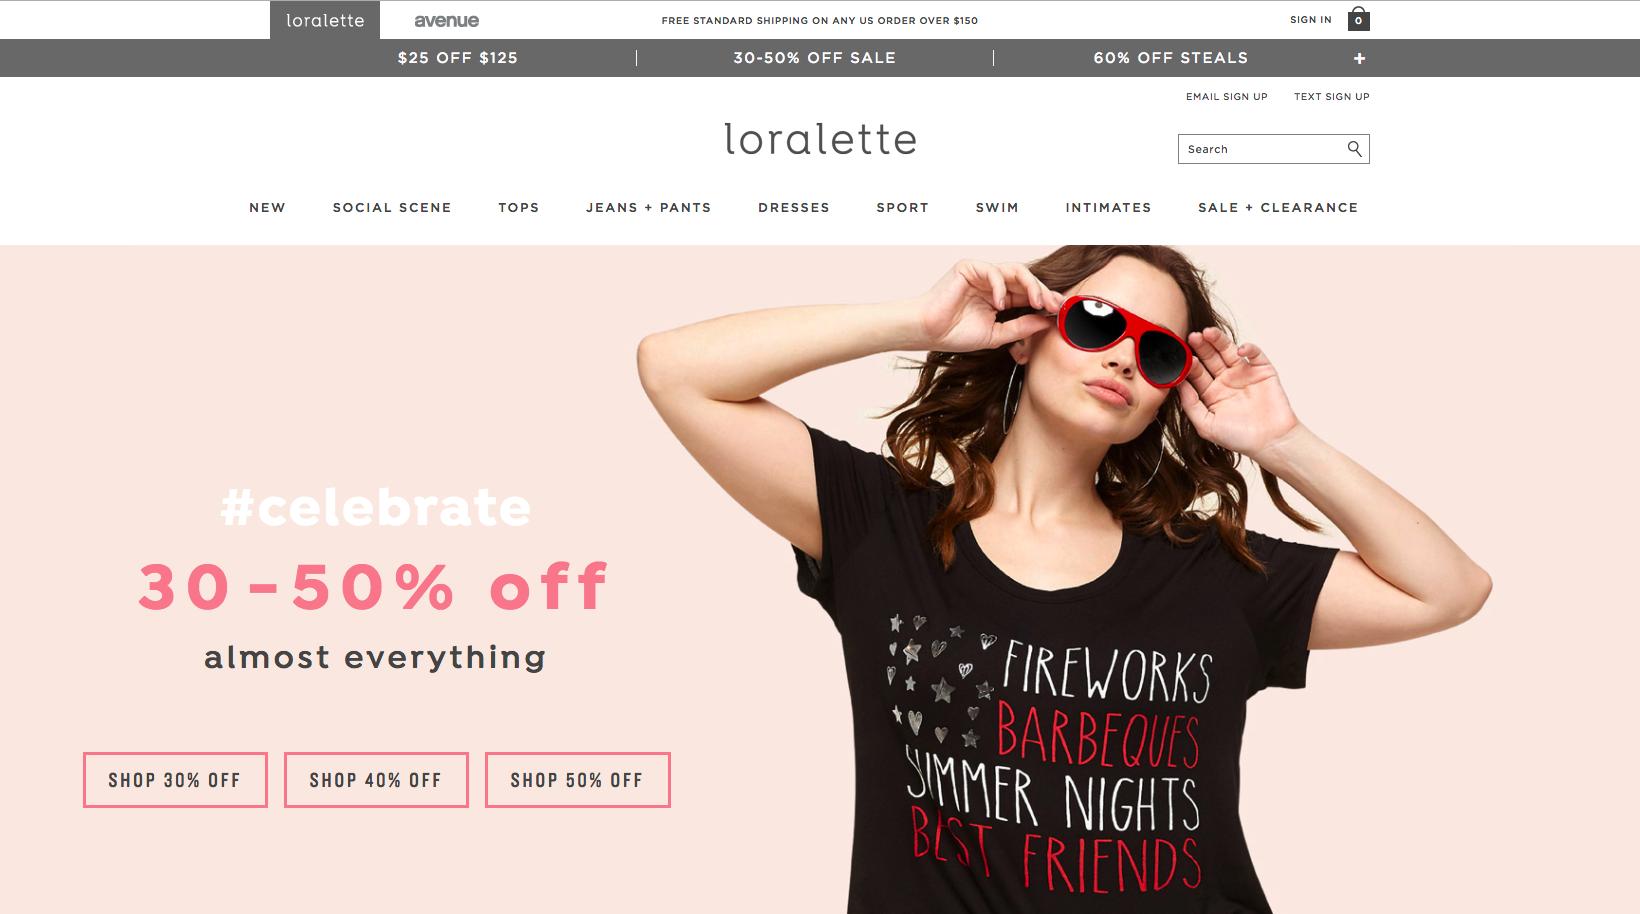 Loralette image